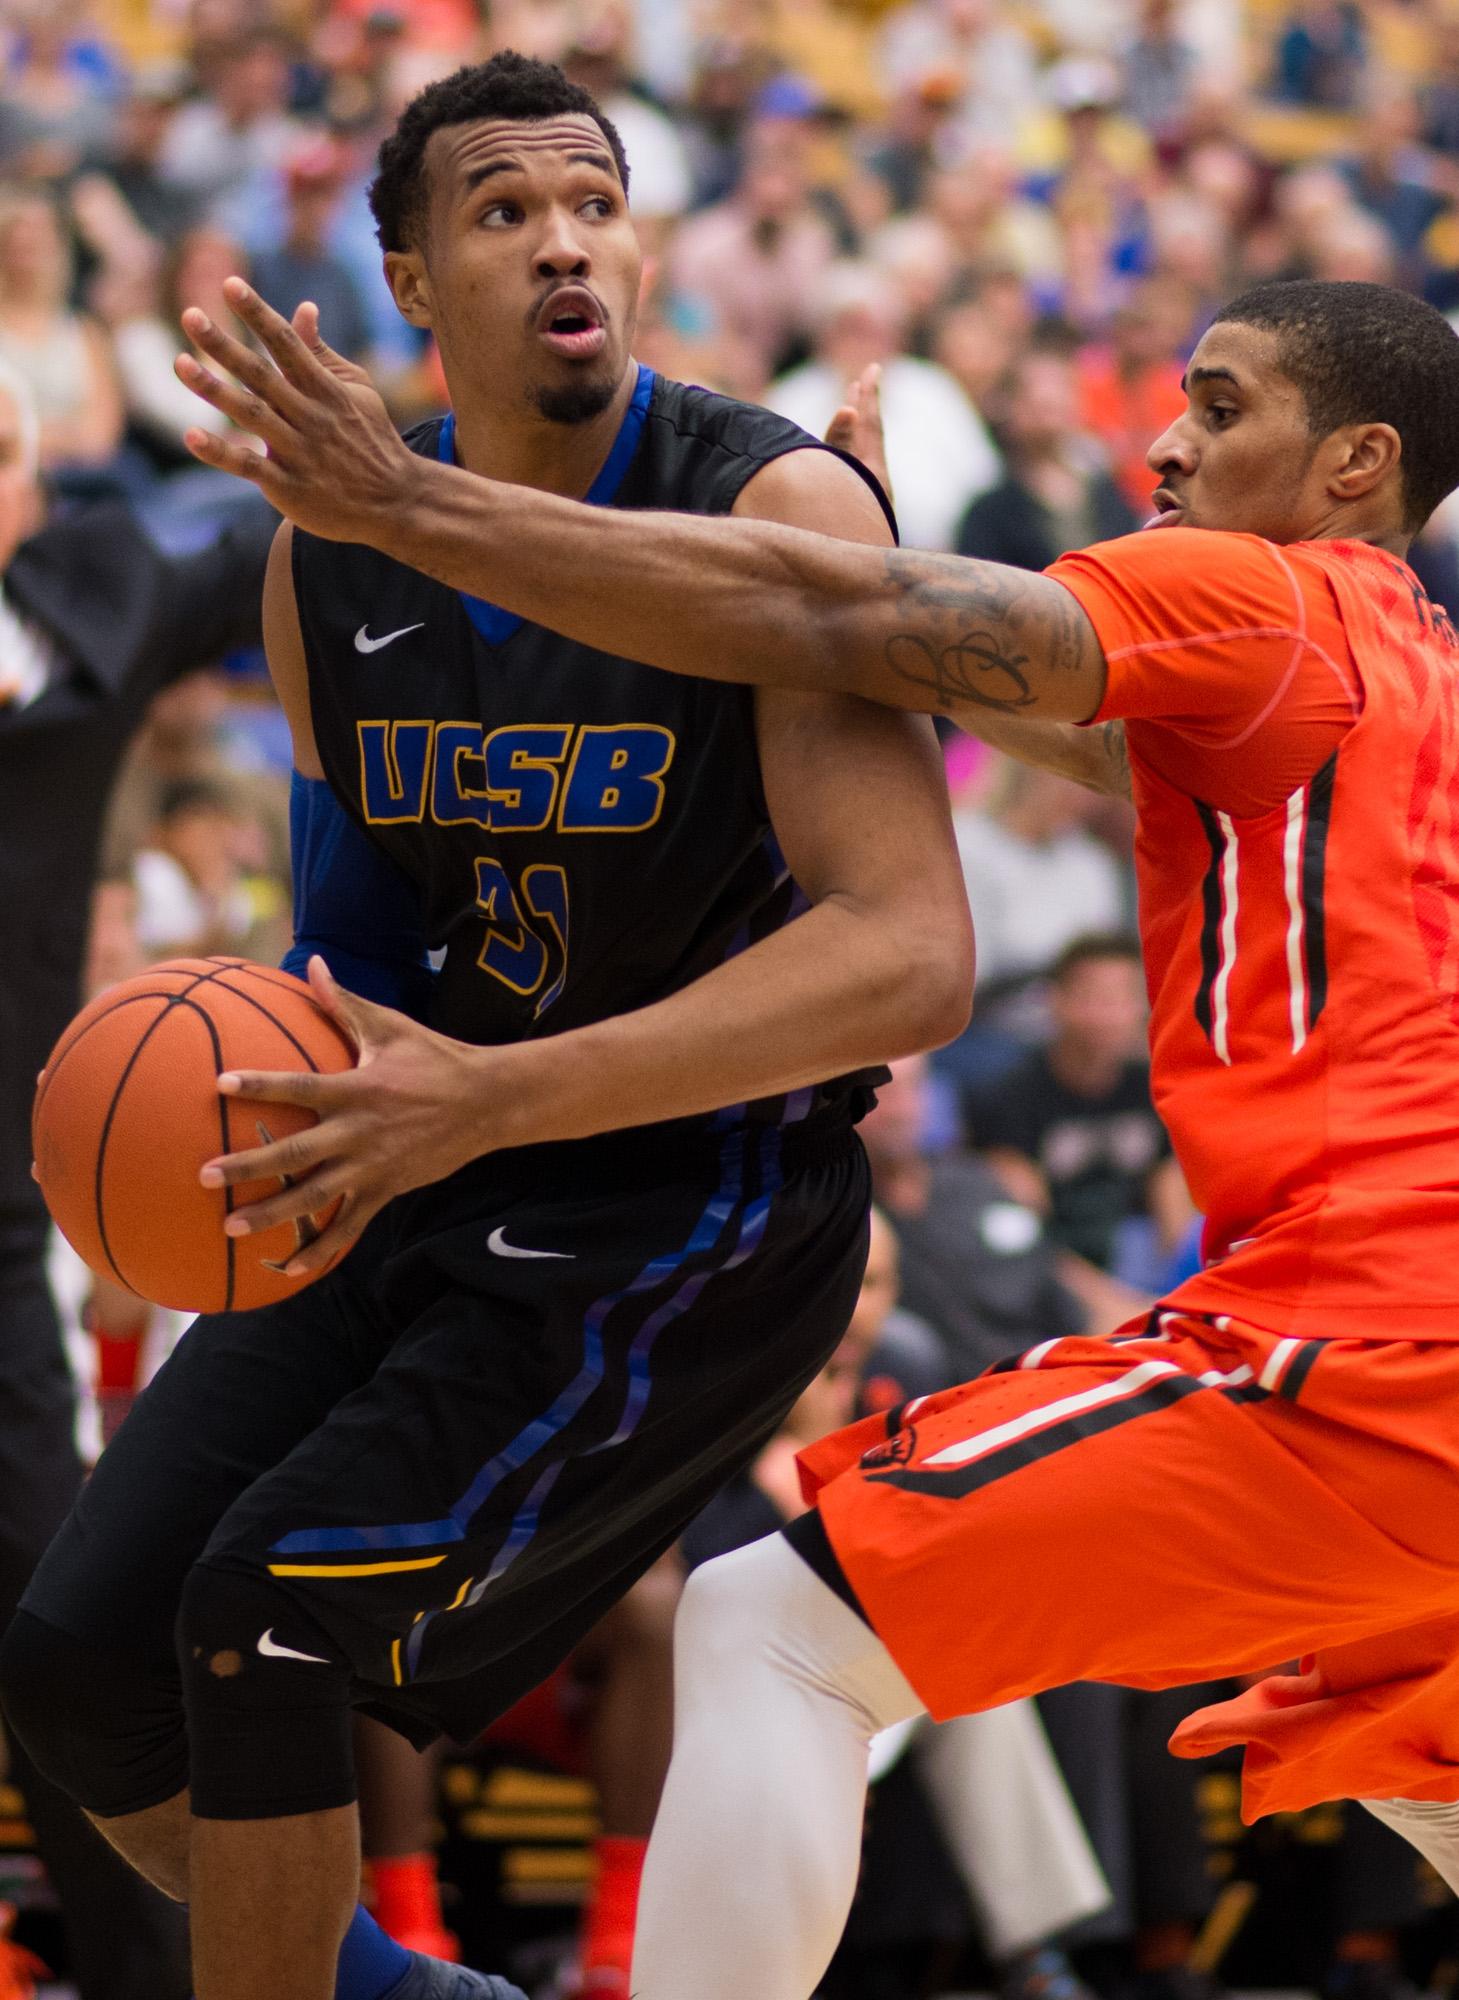 UC Santa Barbara guard John Green looks for a shot against Oregon State's Gary Payton II during an NCAA college basketball game Saturday, Nov. 21, 2015, in Santa Barbara, Calif. (Michael Moriatis/The News-Press via AP)